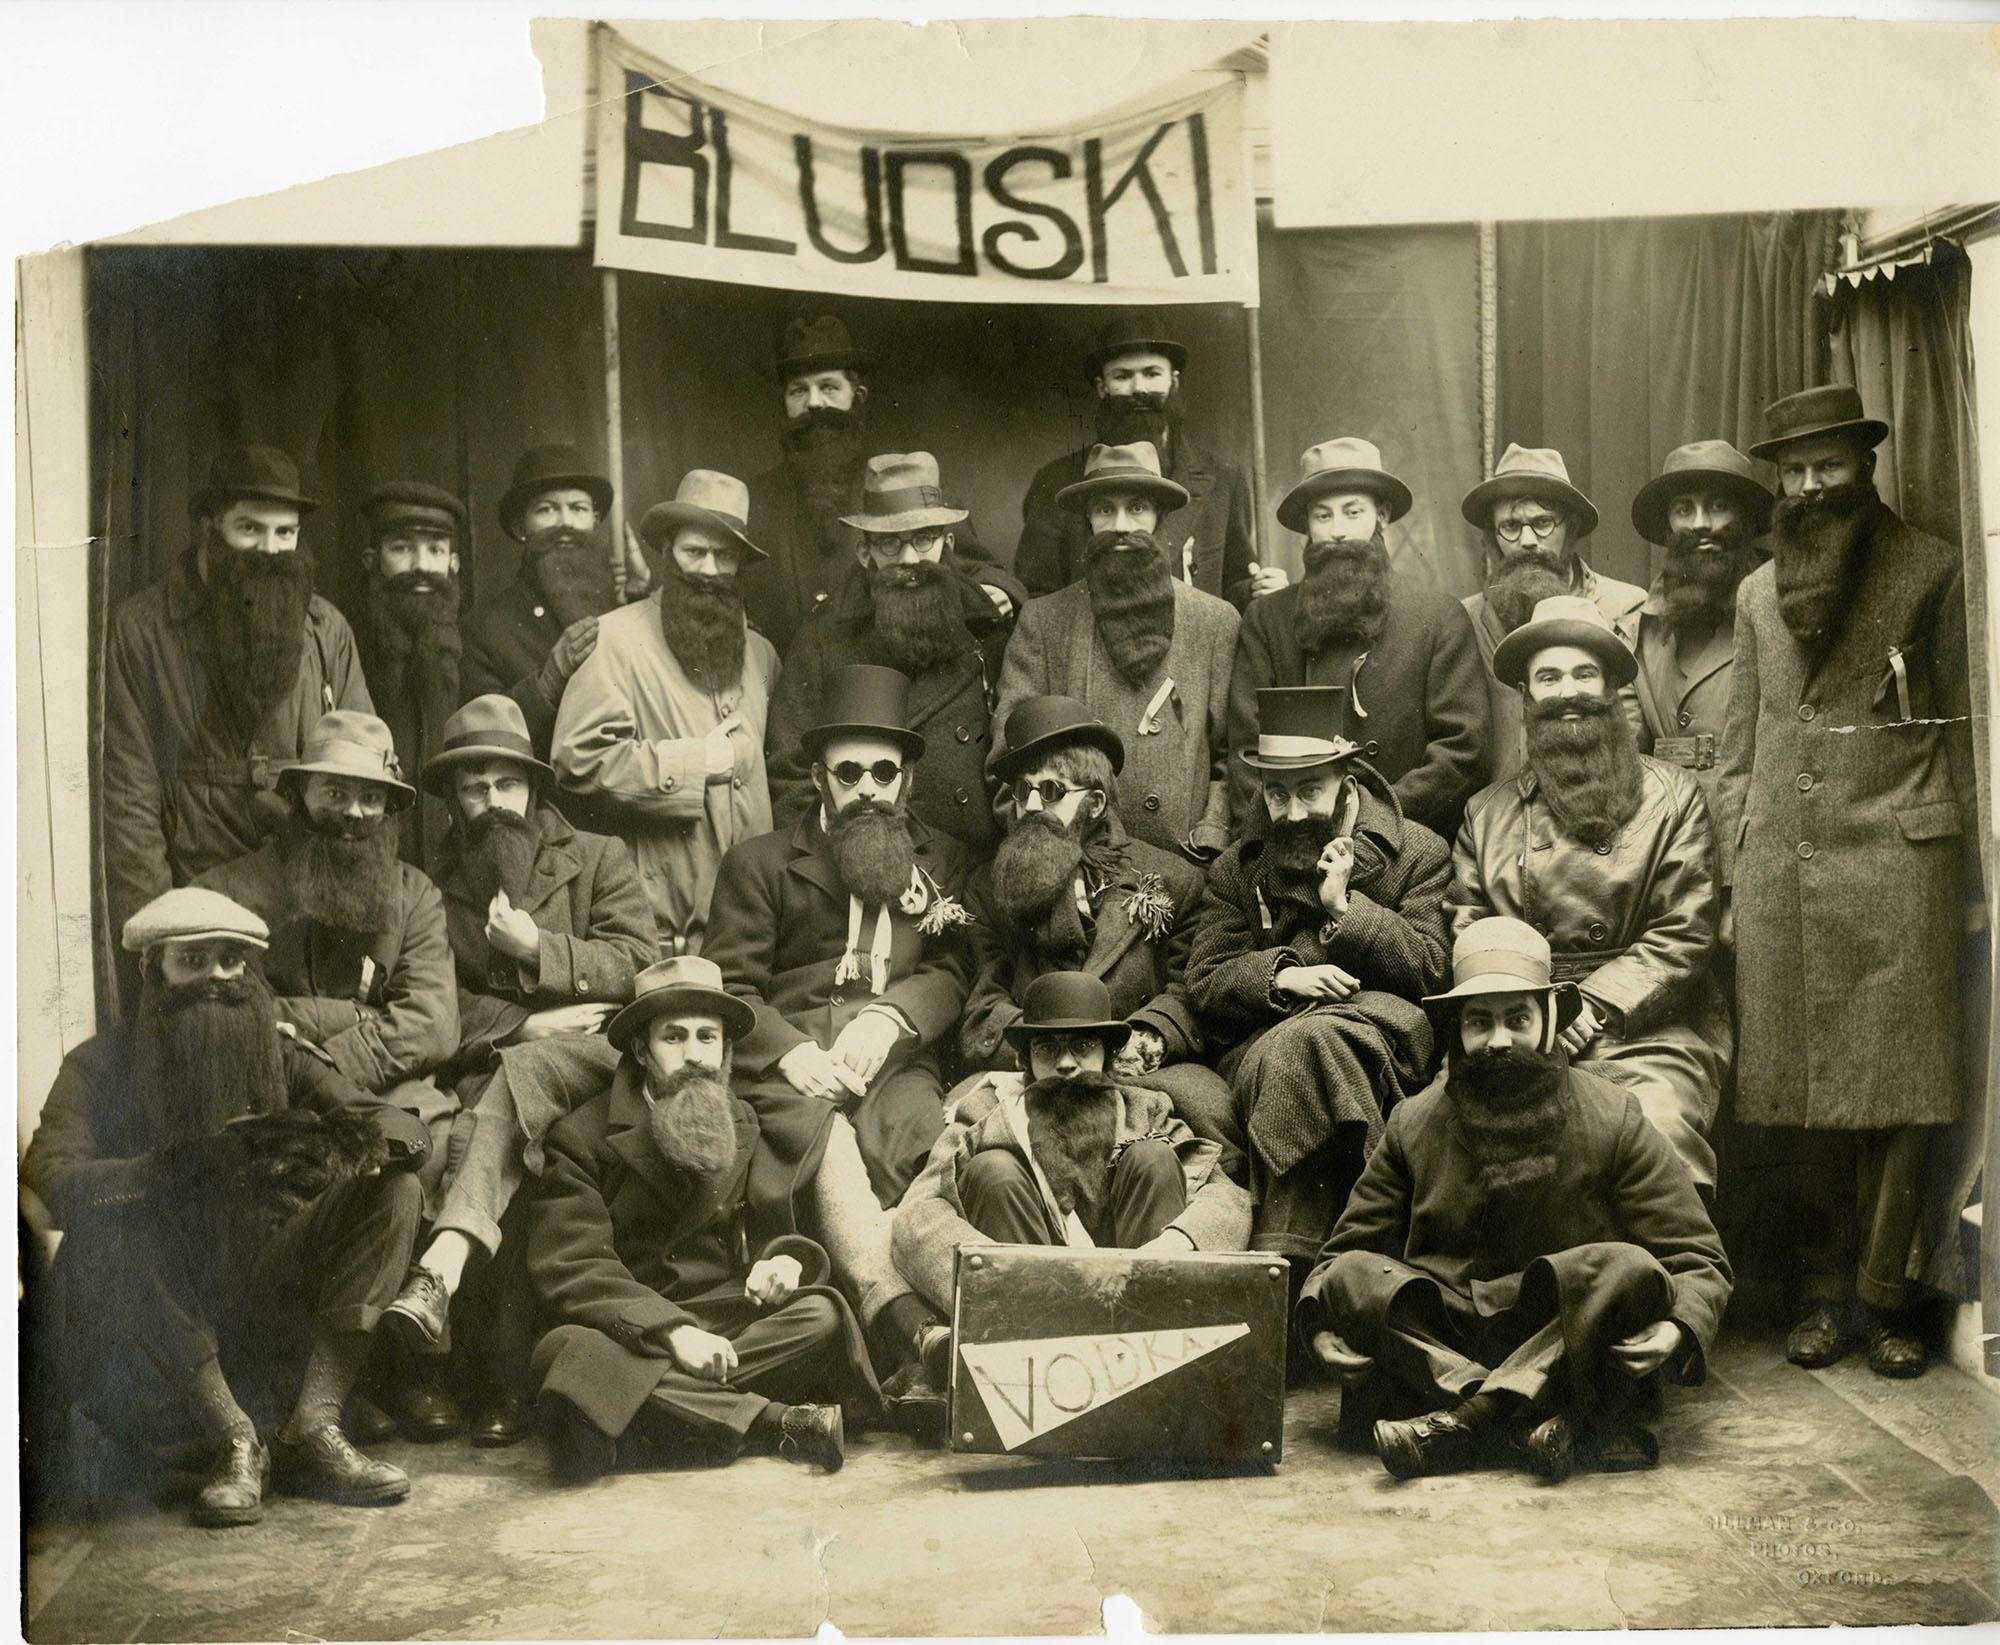 bludski-group-pembroke-college-oxford-small.jpg